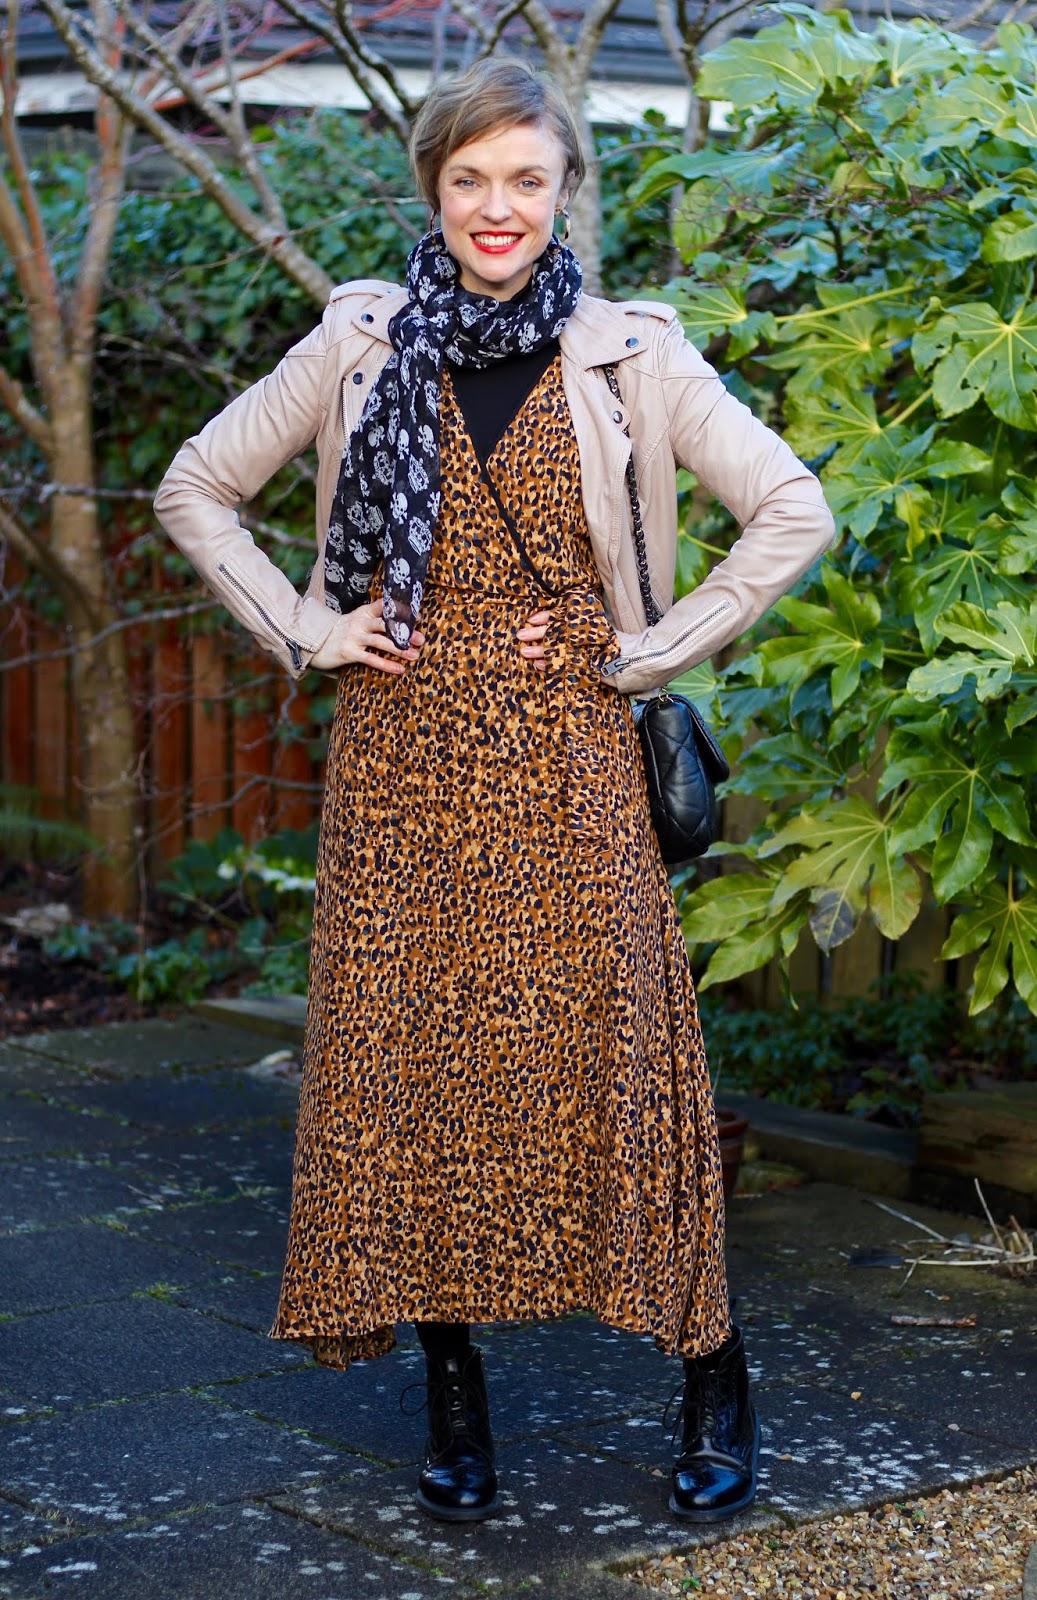 Leopard Zara midi dress | Nude Superdry Jacket | Winter outfit